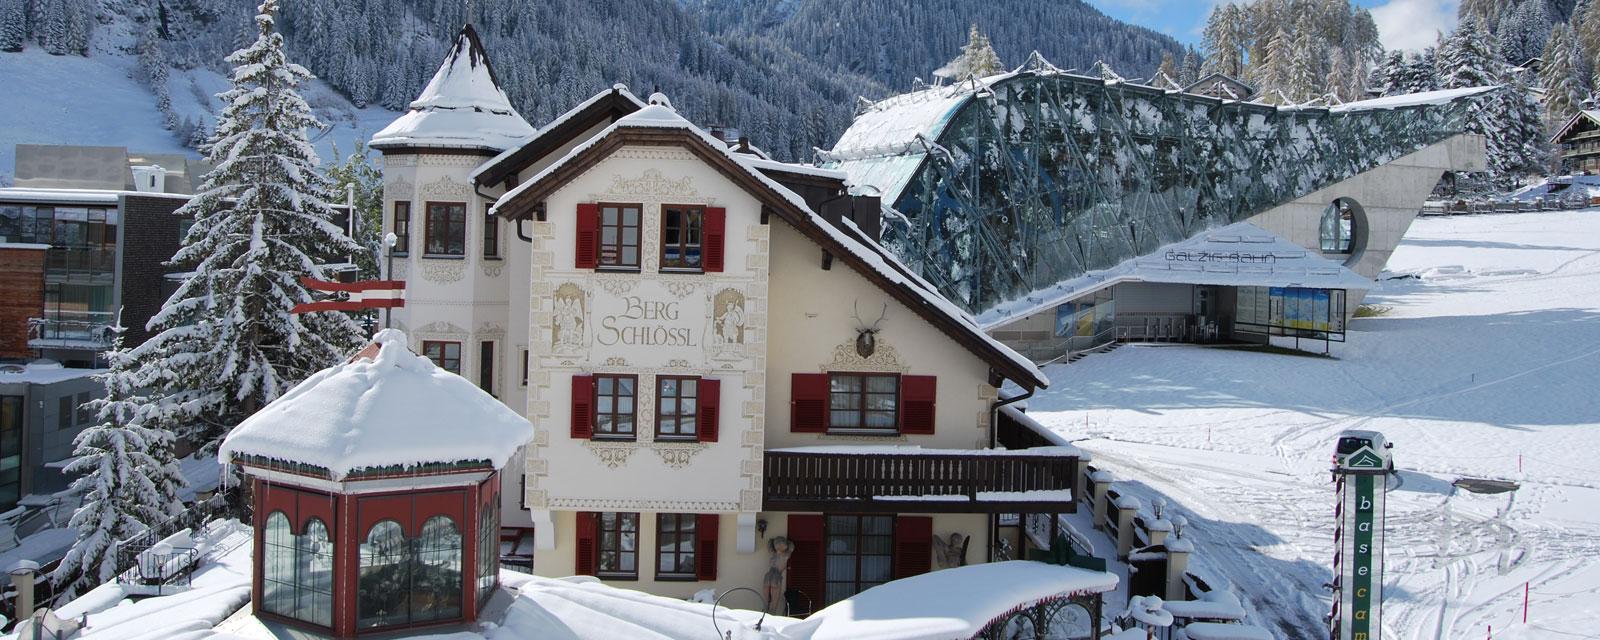 Hotel Bergschlössl im Winter